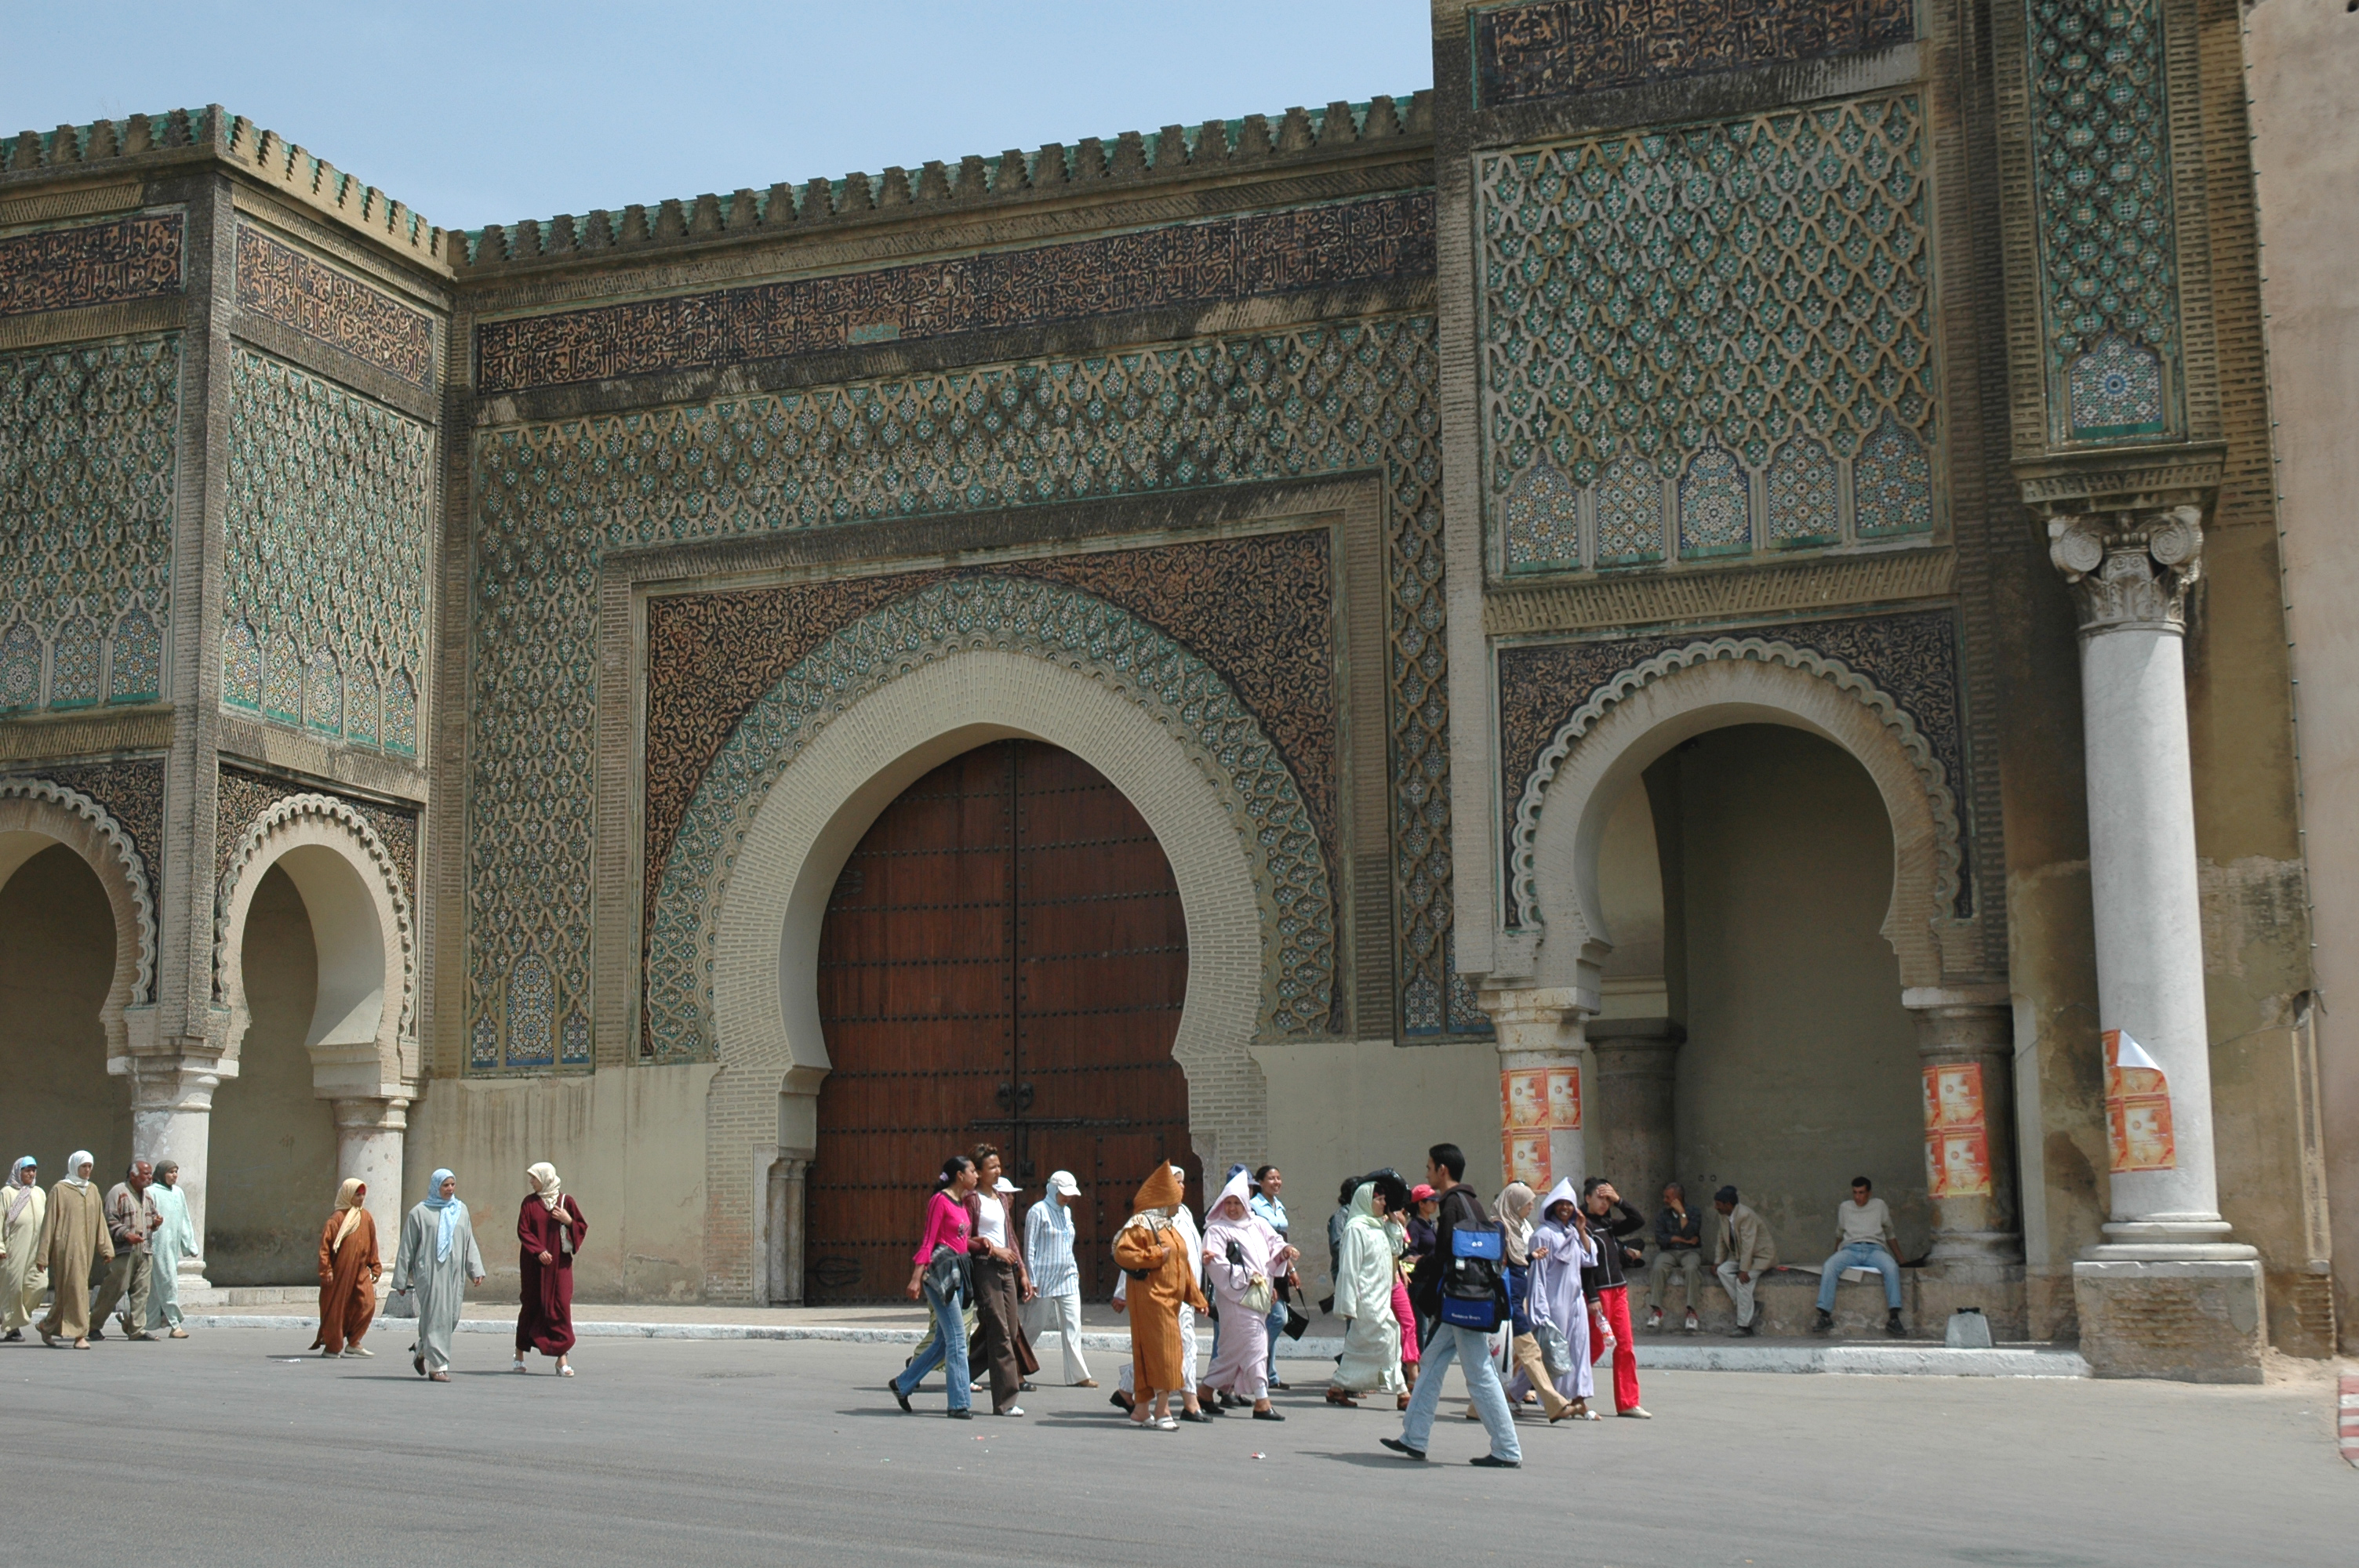 MEKNES Bab el Mansour